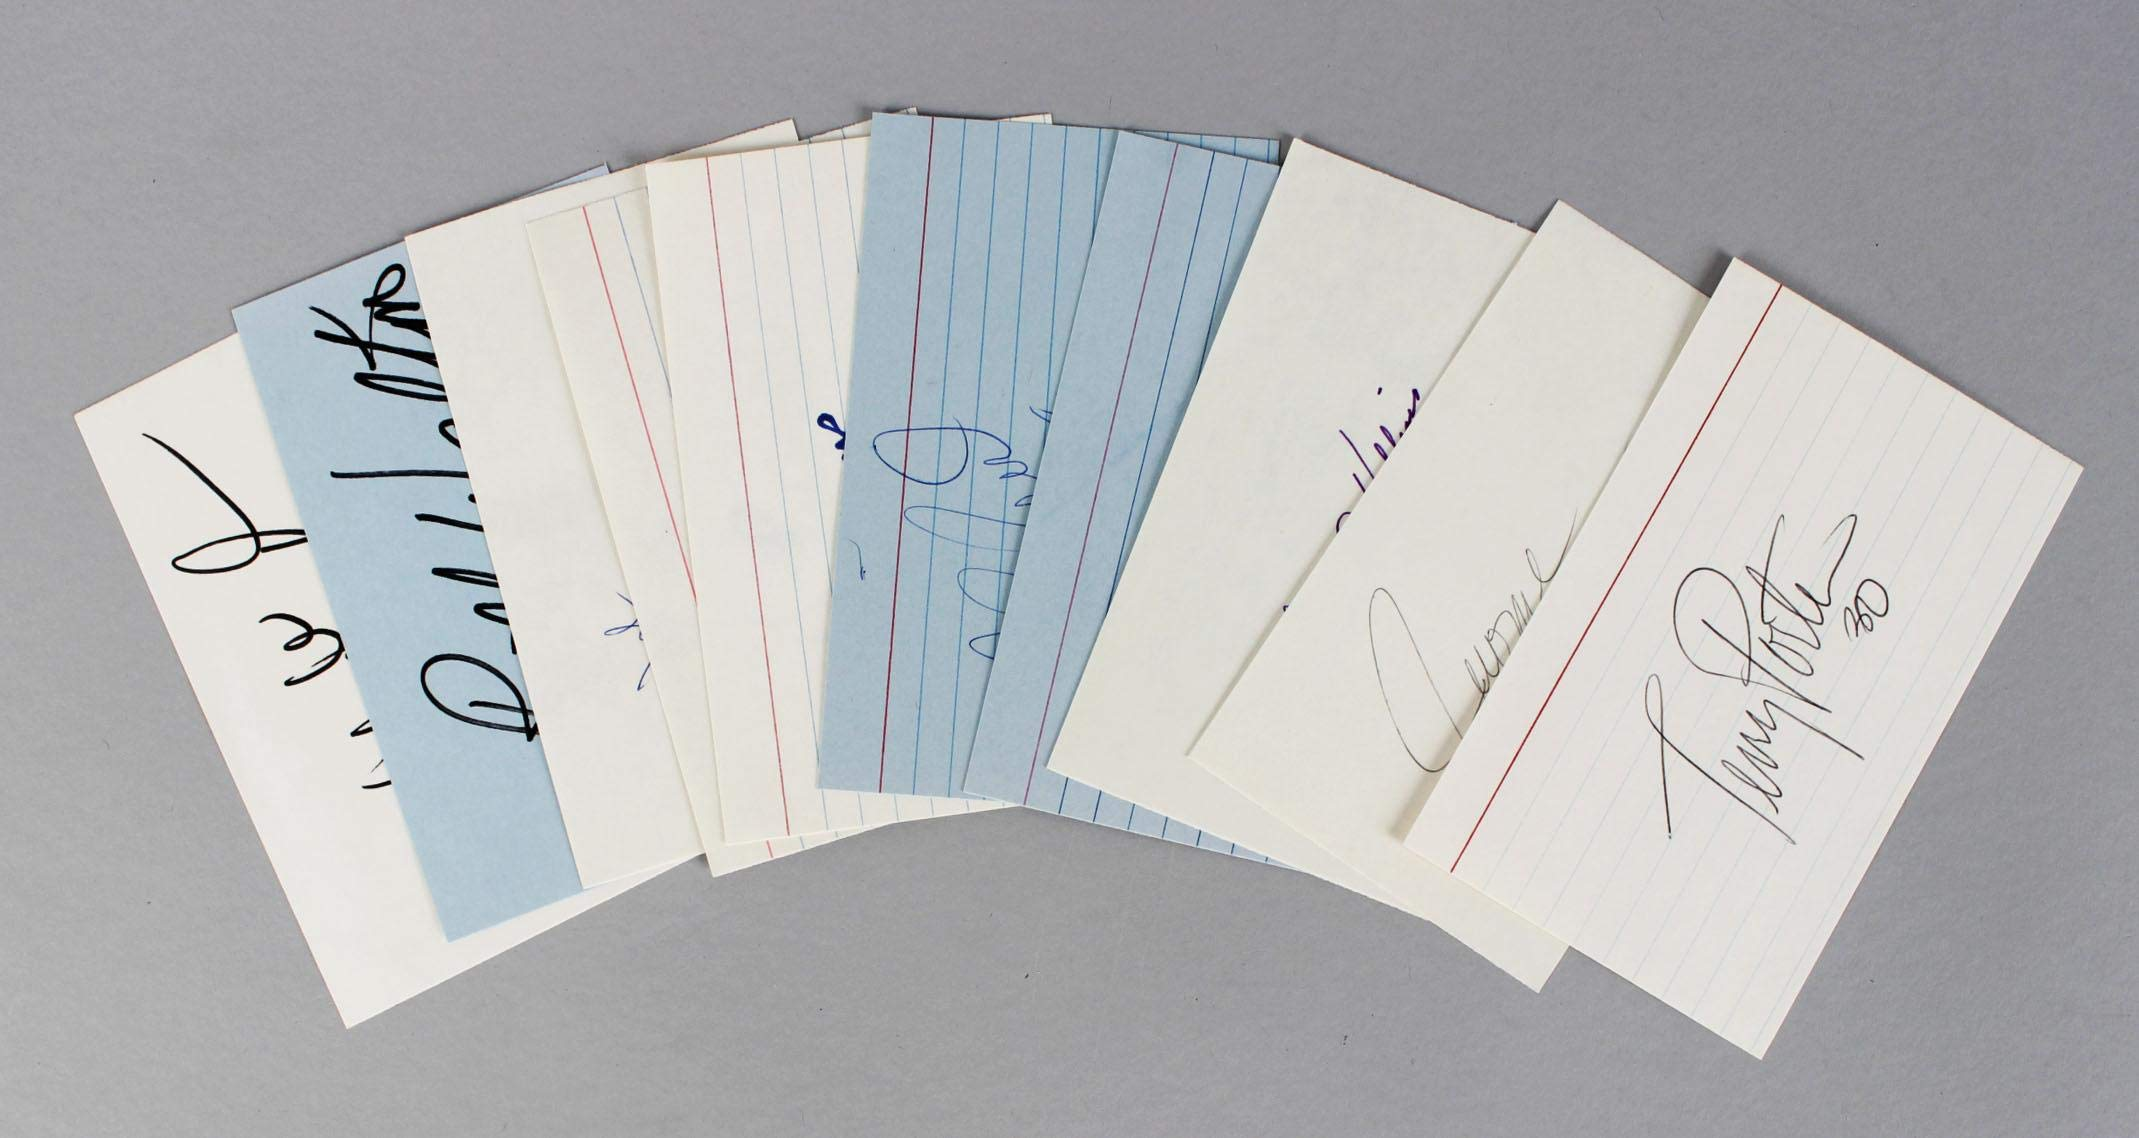 Portland Trailblazers Signed 35 Index Card Lot (10) Bill Walton, Clyde Drexler, Terry Porter etc. () JSA Certified